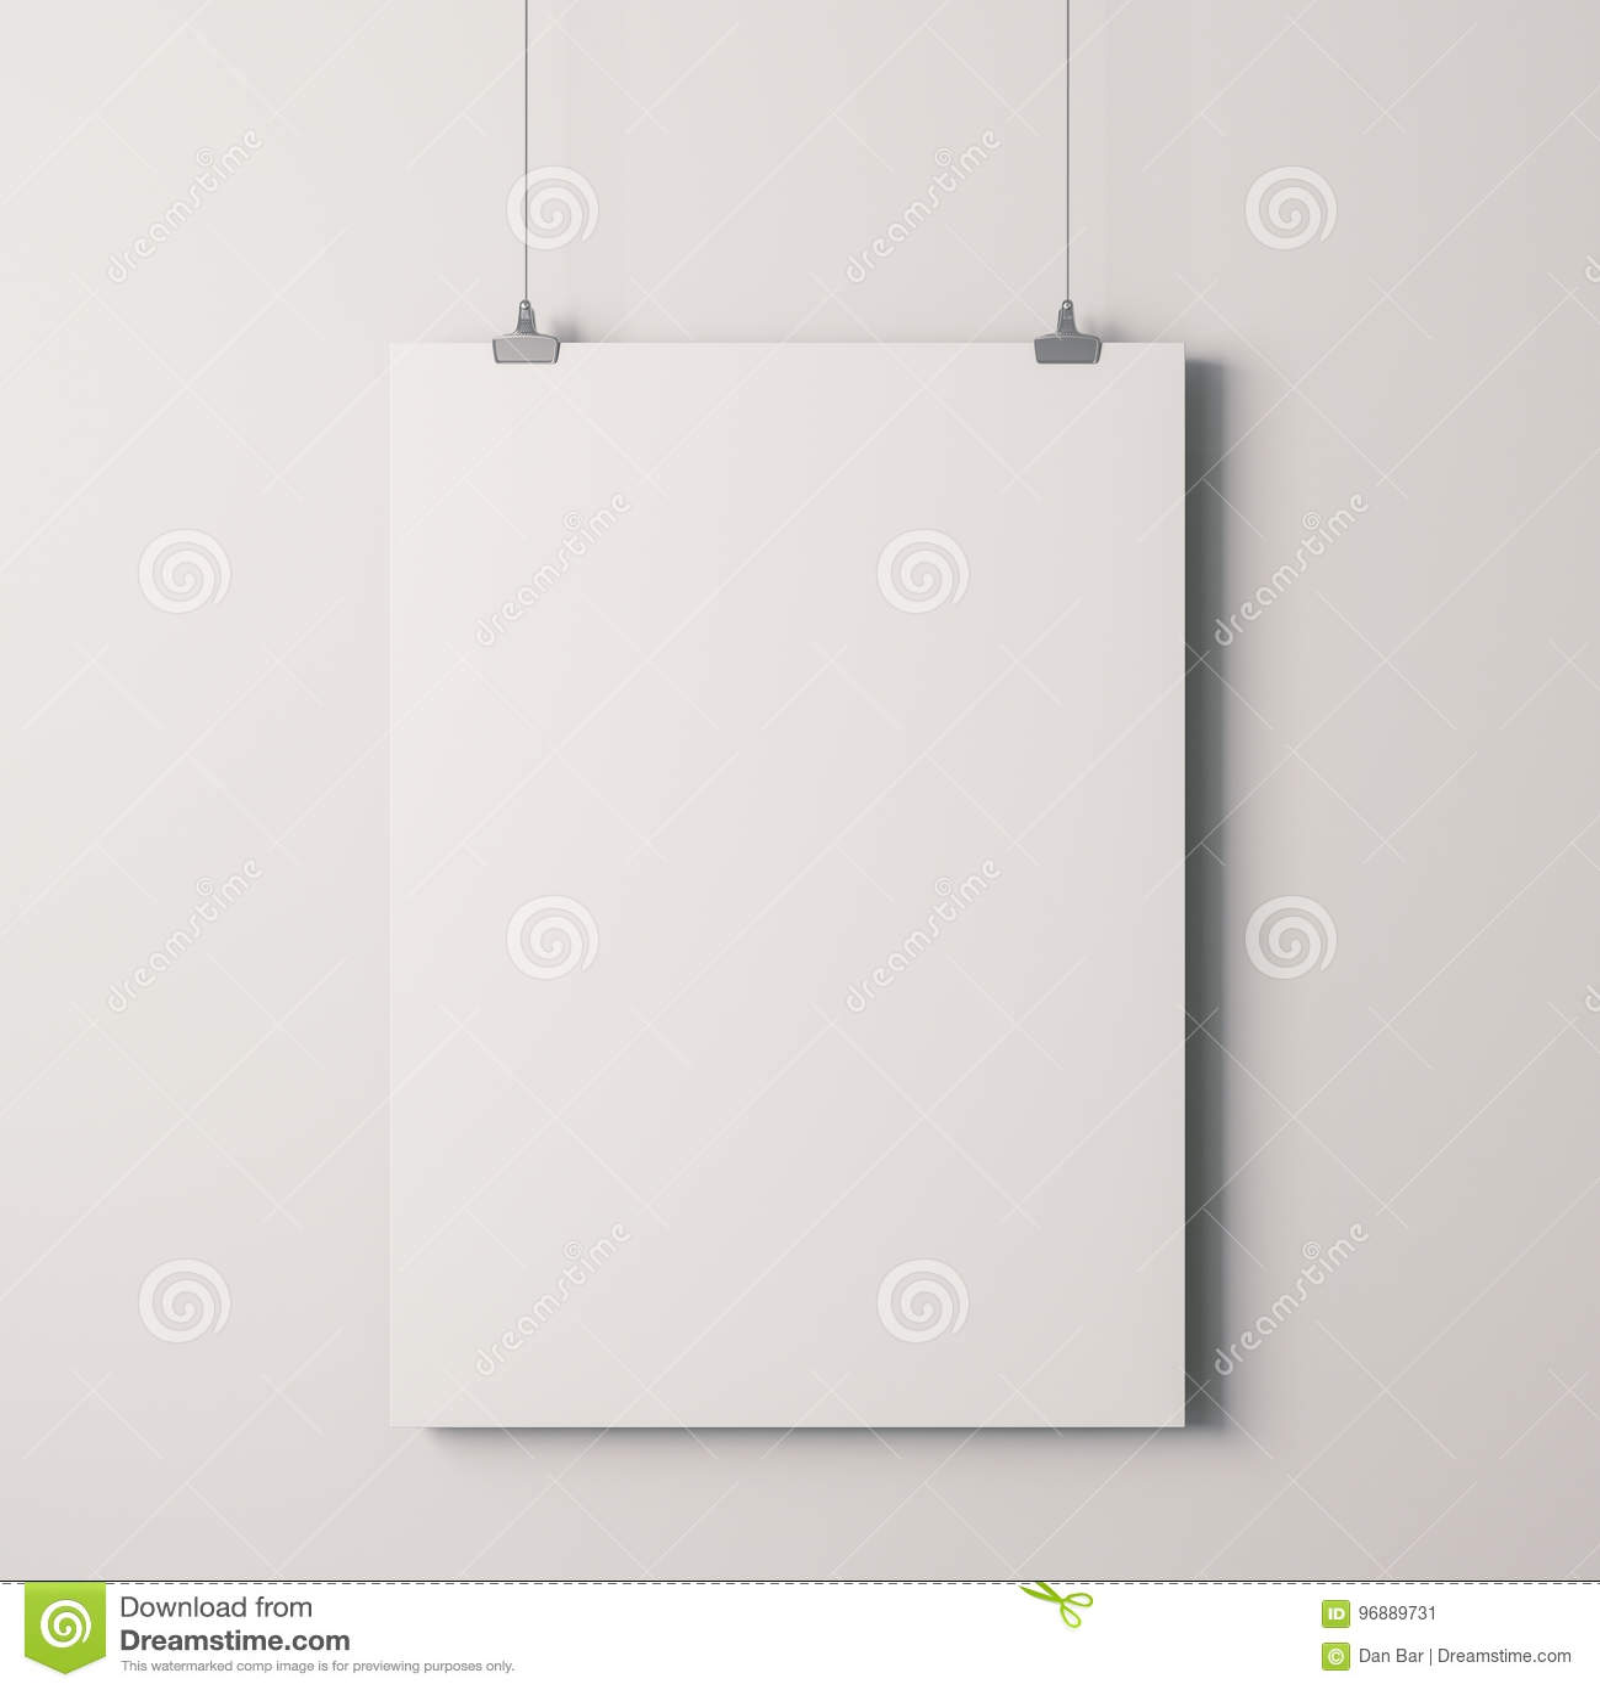 c105da66a2d 3d blank frame poster on white wall. More similar stock illustrations